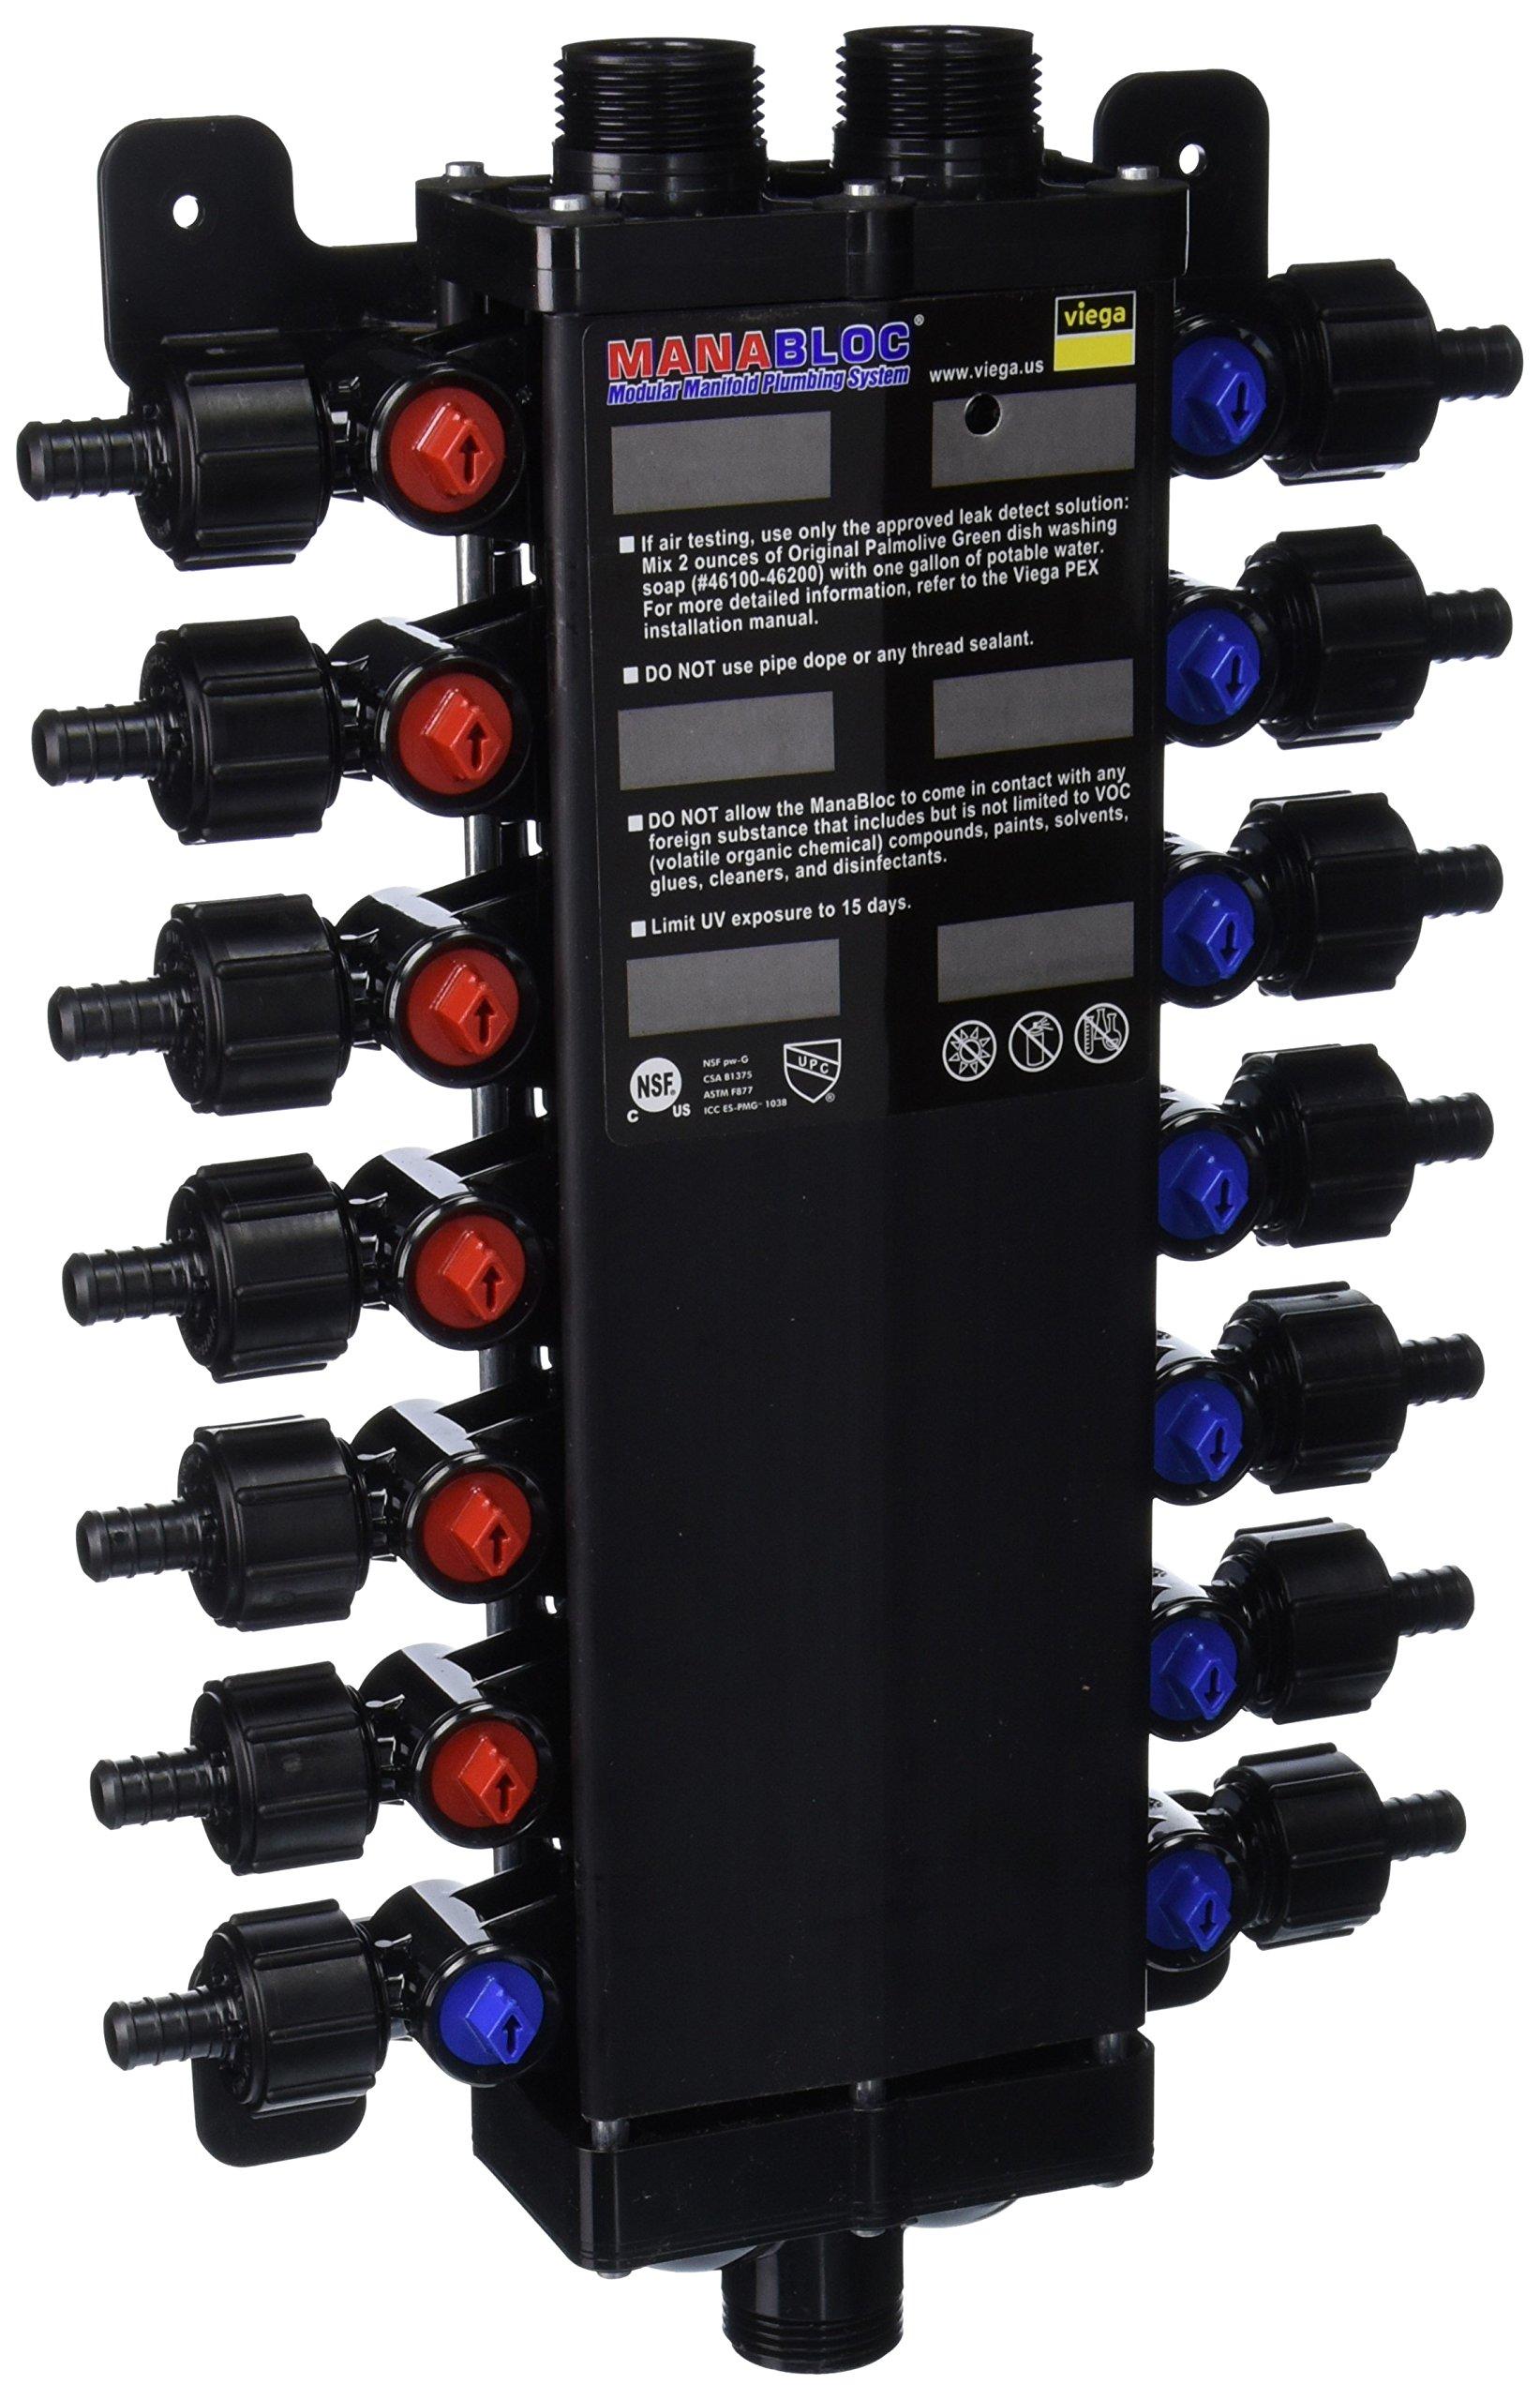 Viega 50143 - 1/2-Inch PureFlow Zero Lead Poly Alloy PEX Crimp Manabloc With 14 Ports - 8 Cold 6 Hot by Viega